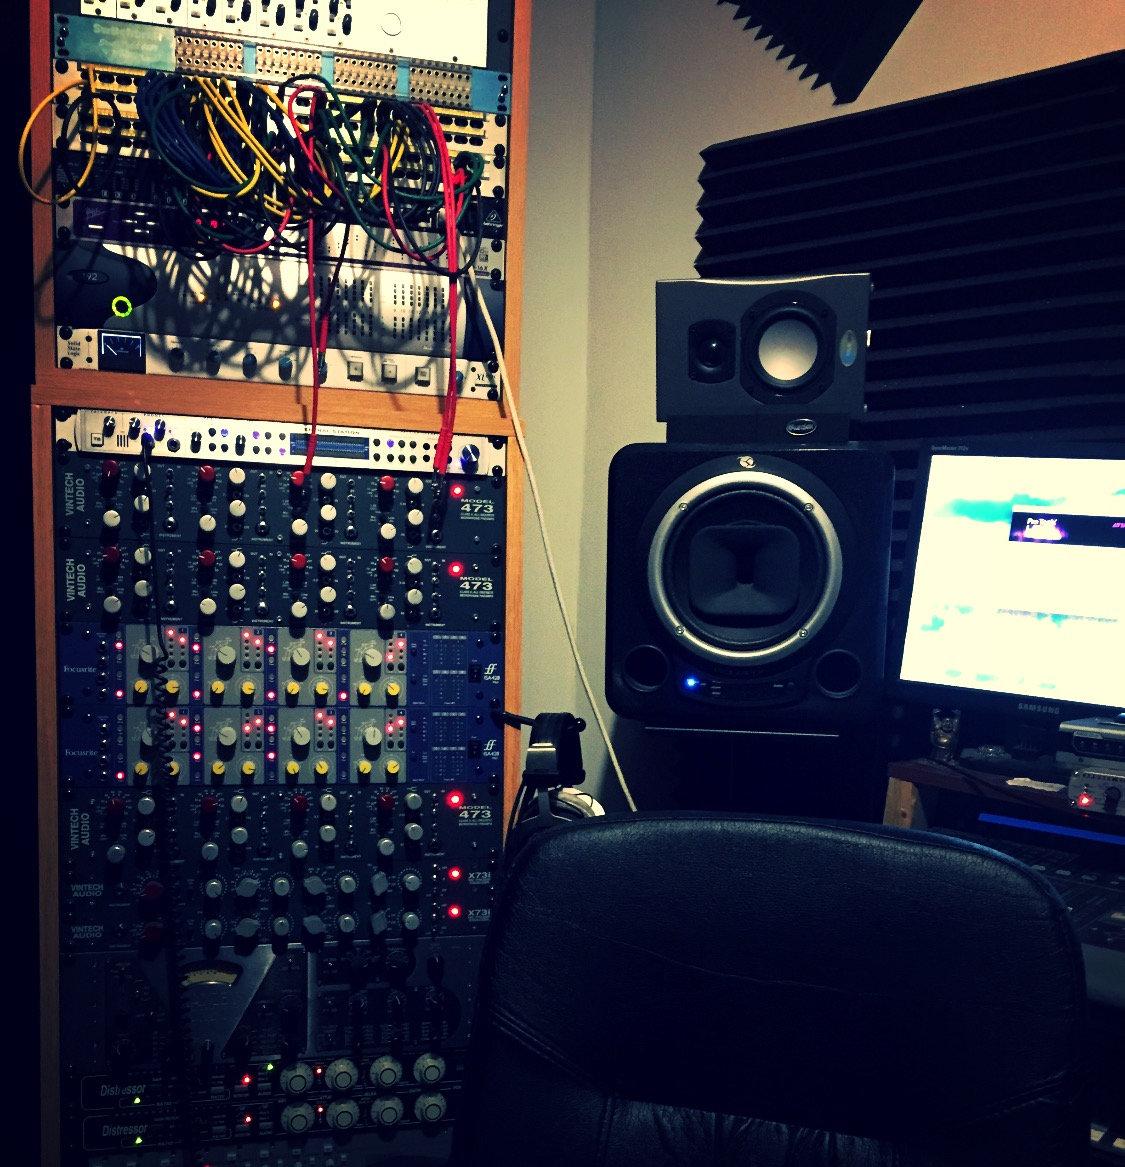 Production, Editing, Mixing